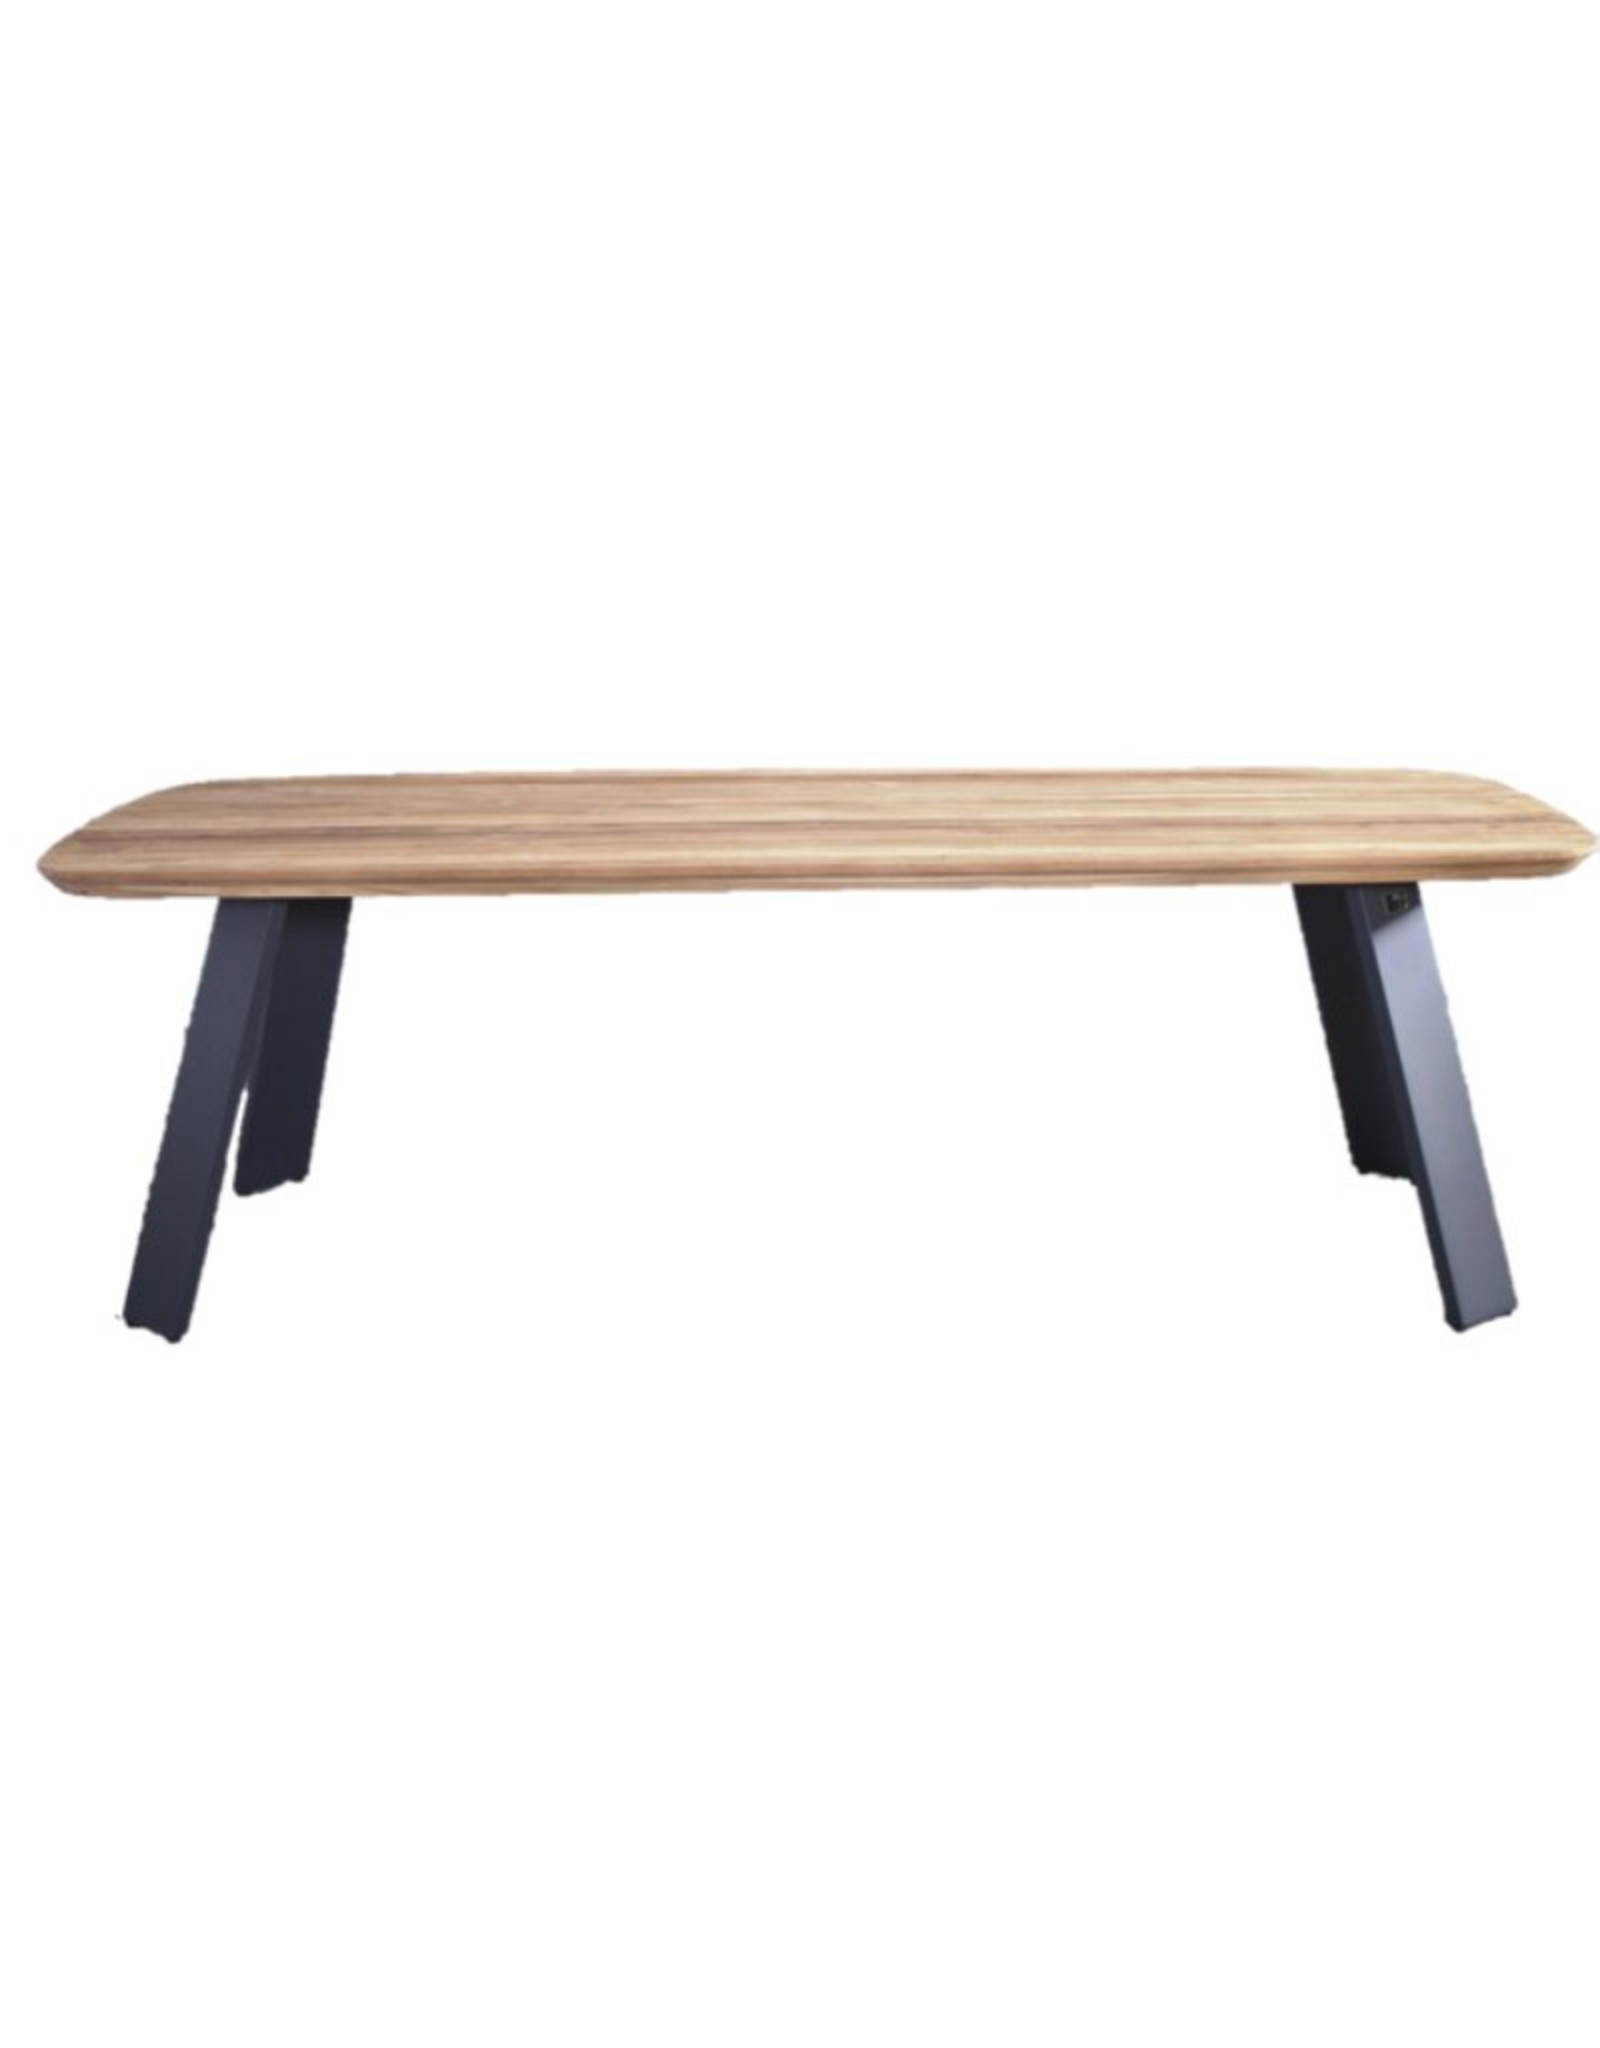 SenS SenS Californië teak table 240x100cm FSC Recycled